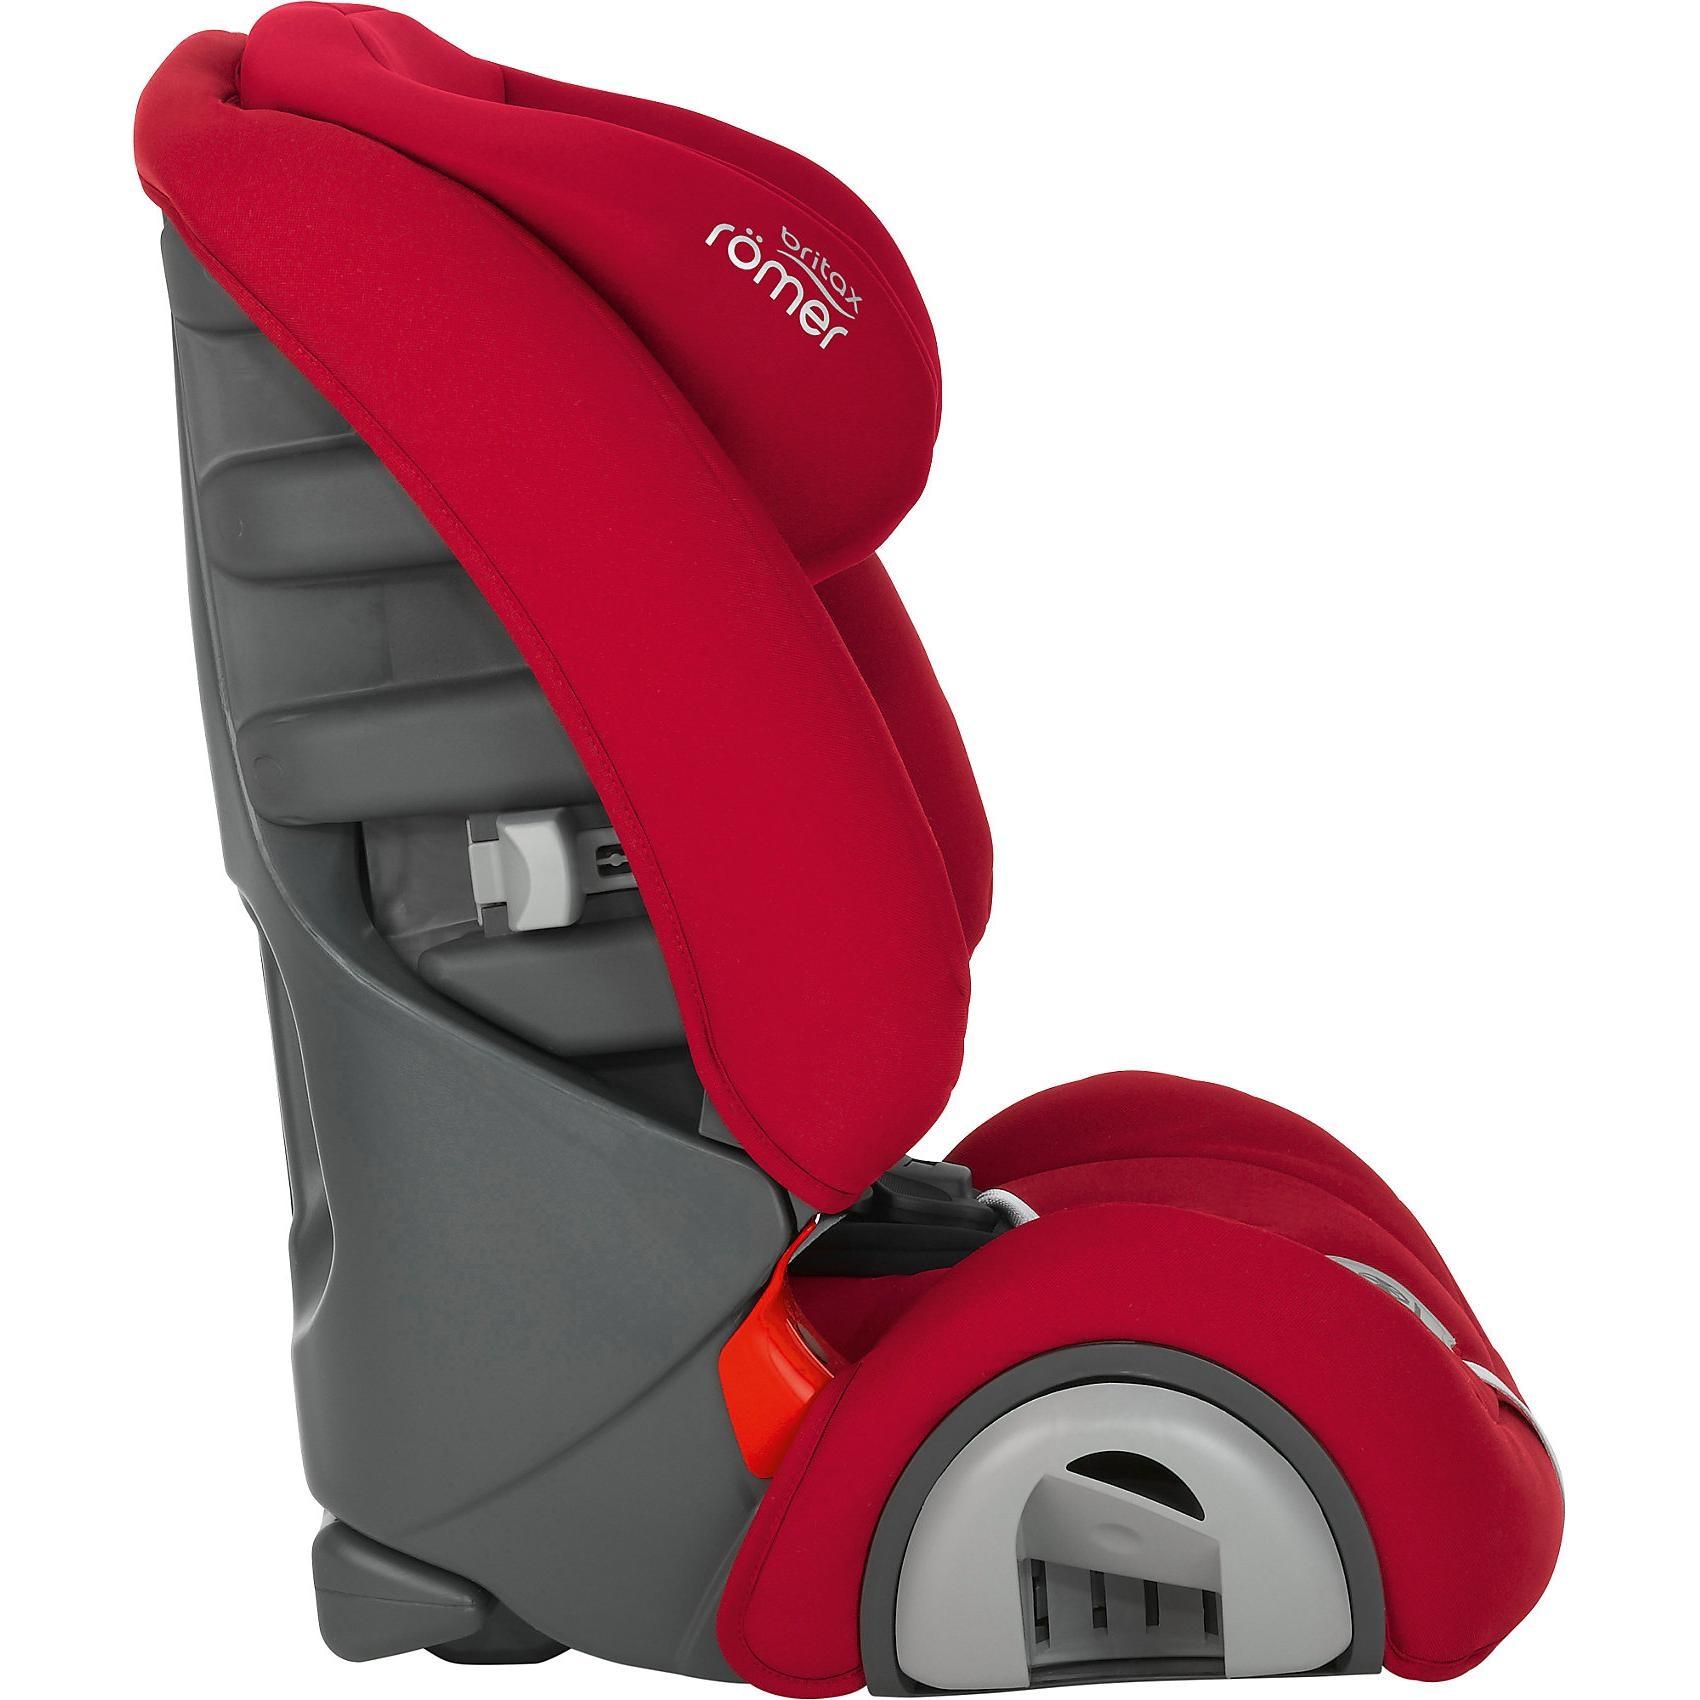 Britax Römer Auto-Kindersitz Evolva 1-2-3 Plus Flame Red 2018